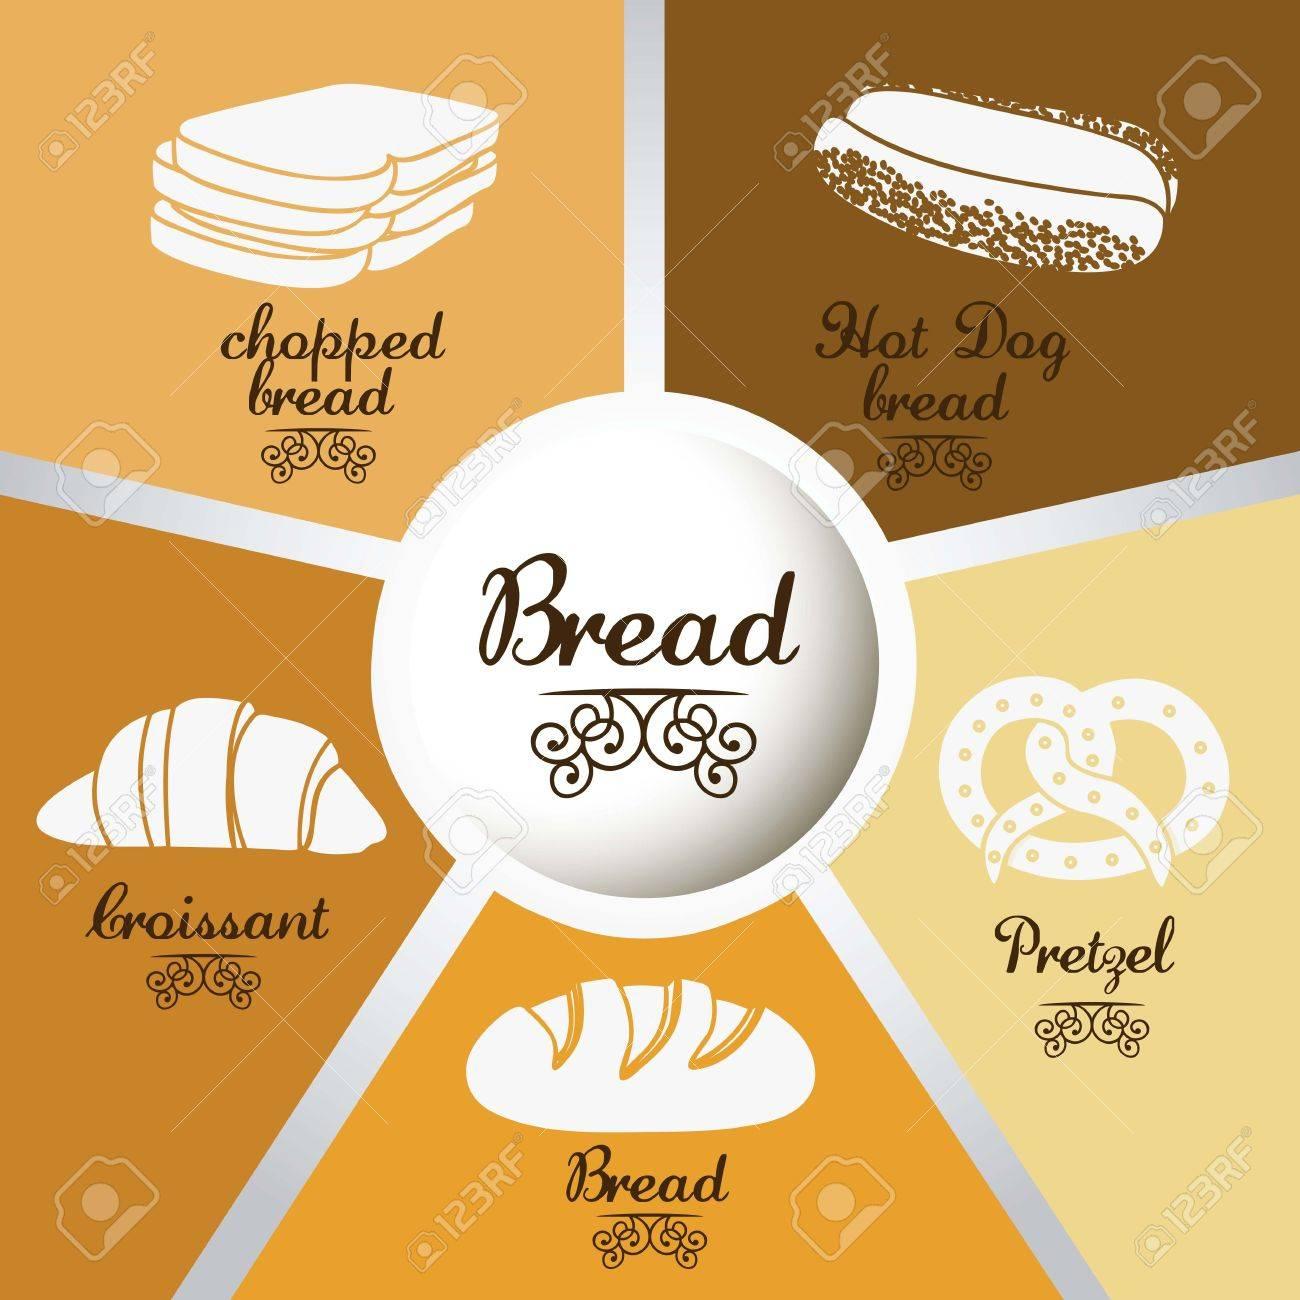 Illustration of  classic bread, croissant, chopped bread, hot dog bread, pretzel. bakery icon, vector illustration Stock Vector - 17004294